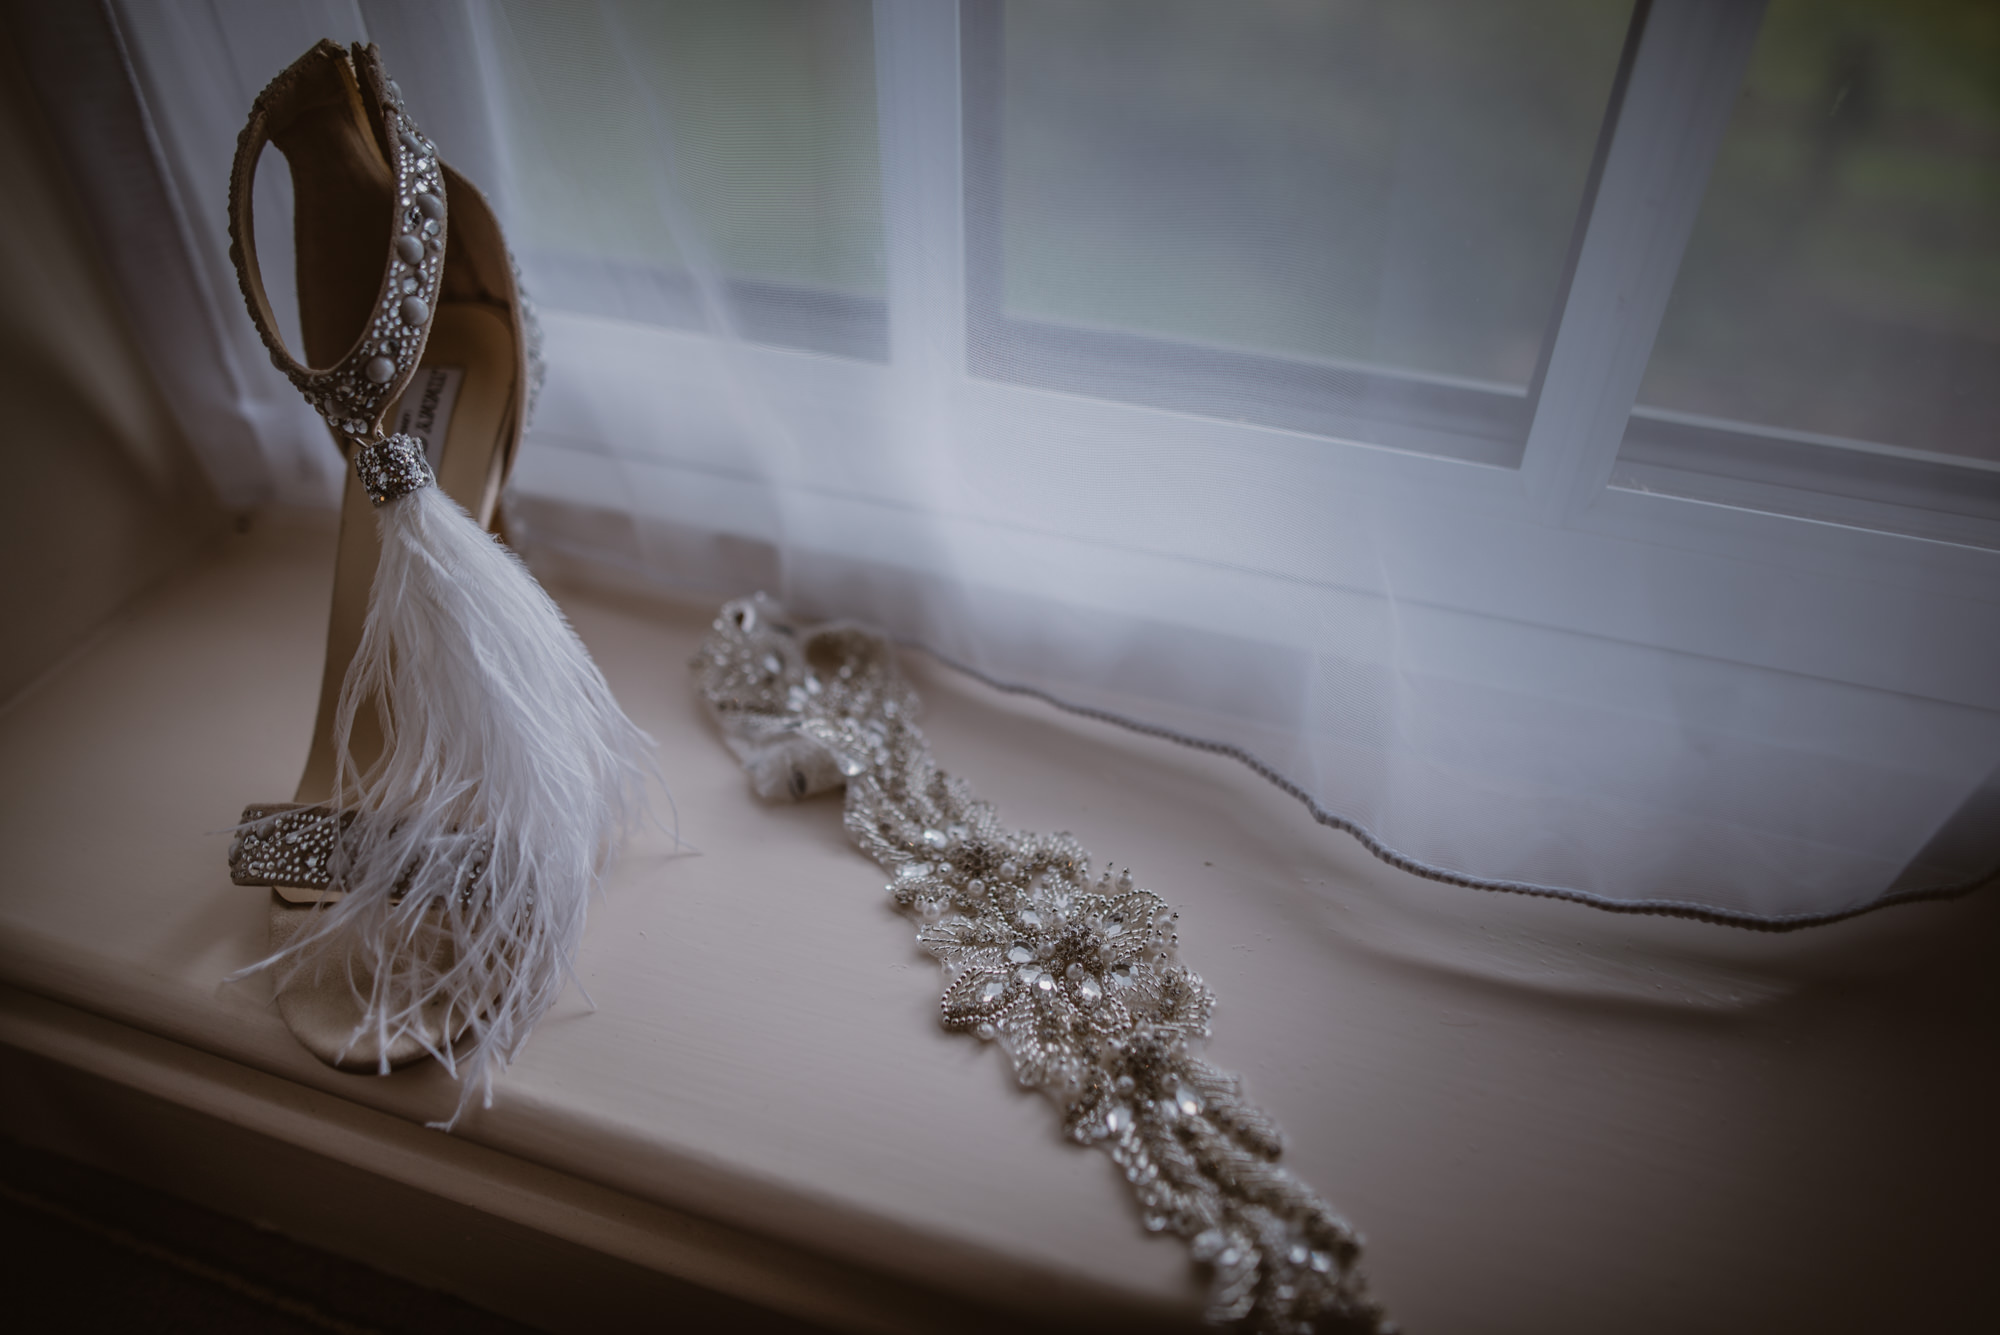 Jacqueline-Gareth-Wedding-Westmead-Events-Surrey-Manu-Mendoza-Wedding-Photography-102.jpg